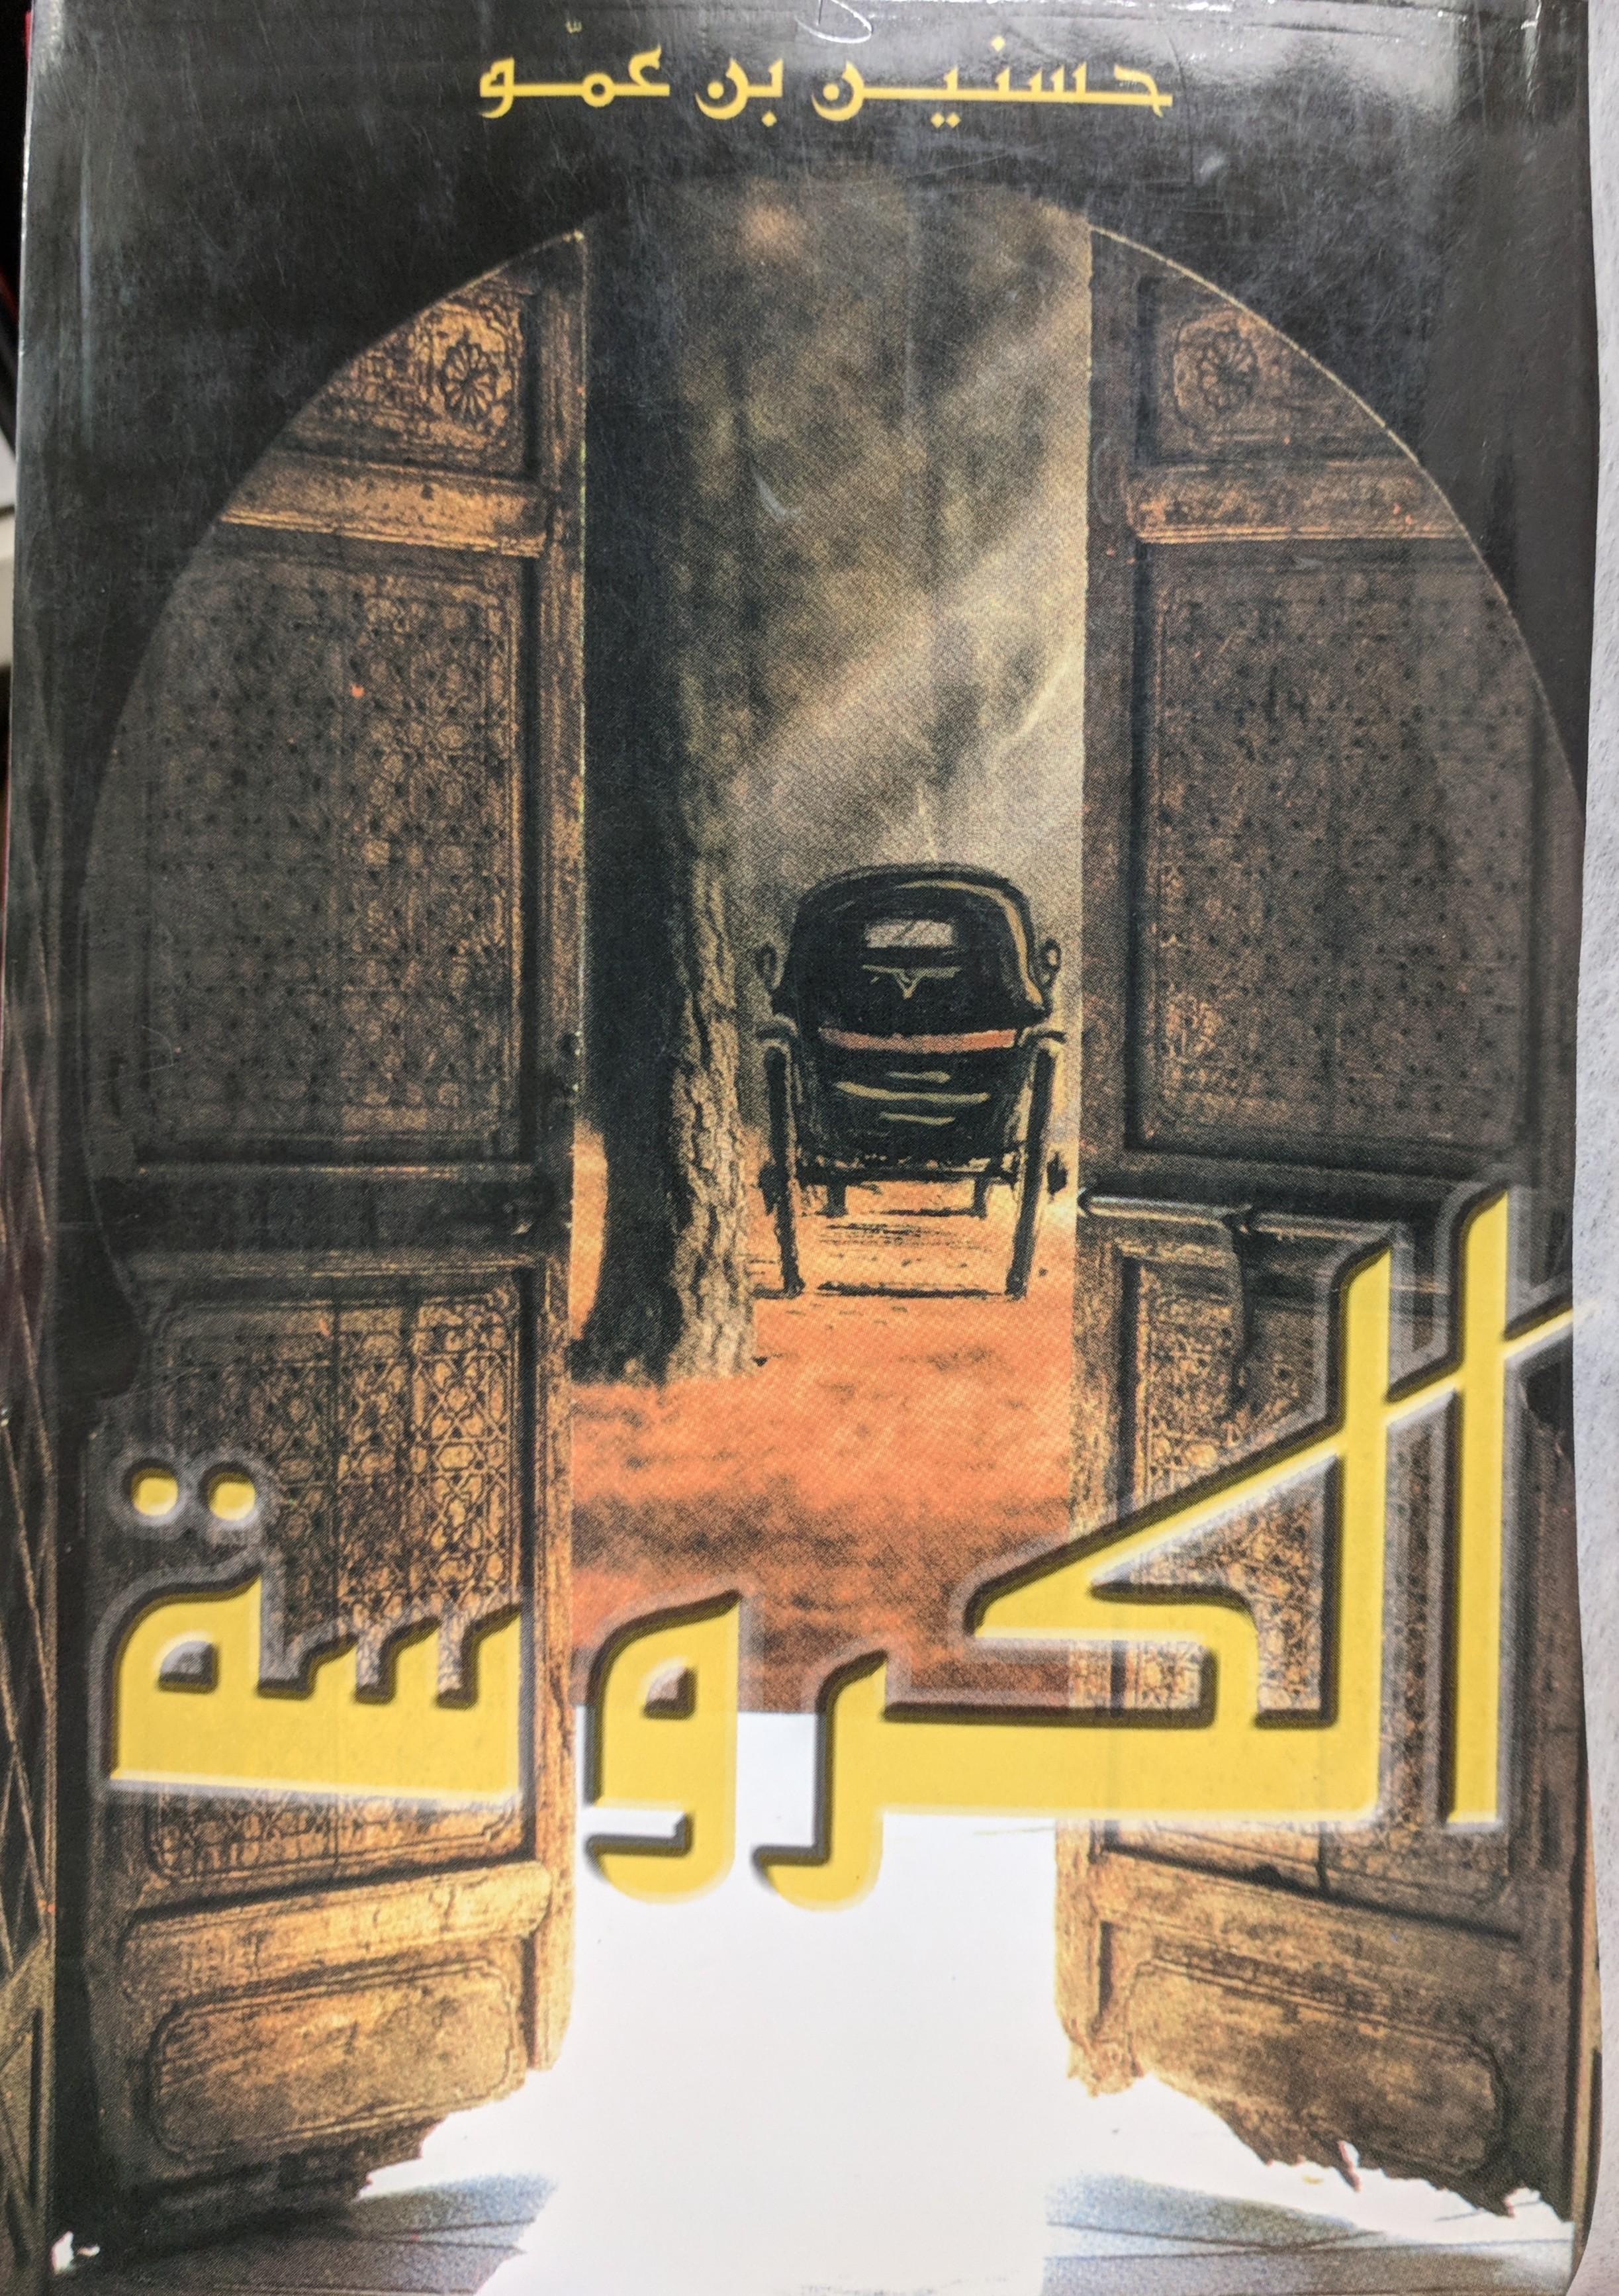 Ḥasanayn Bin ʻAmmū (Tūnis: al-Sharikah al-Tūnisiyyah li-l-Nashr wa-Tanmīyat Funūn al-Rasm, 1999)